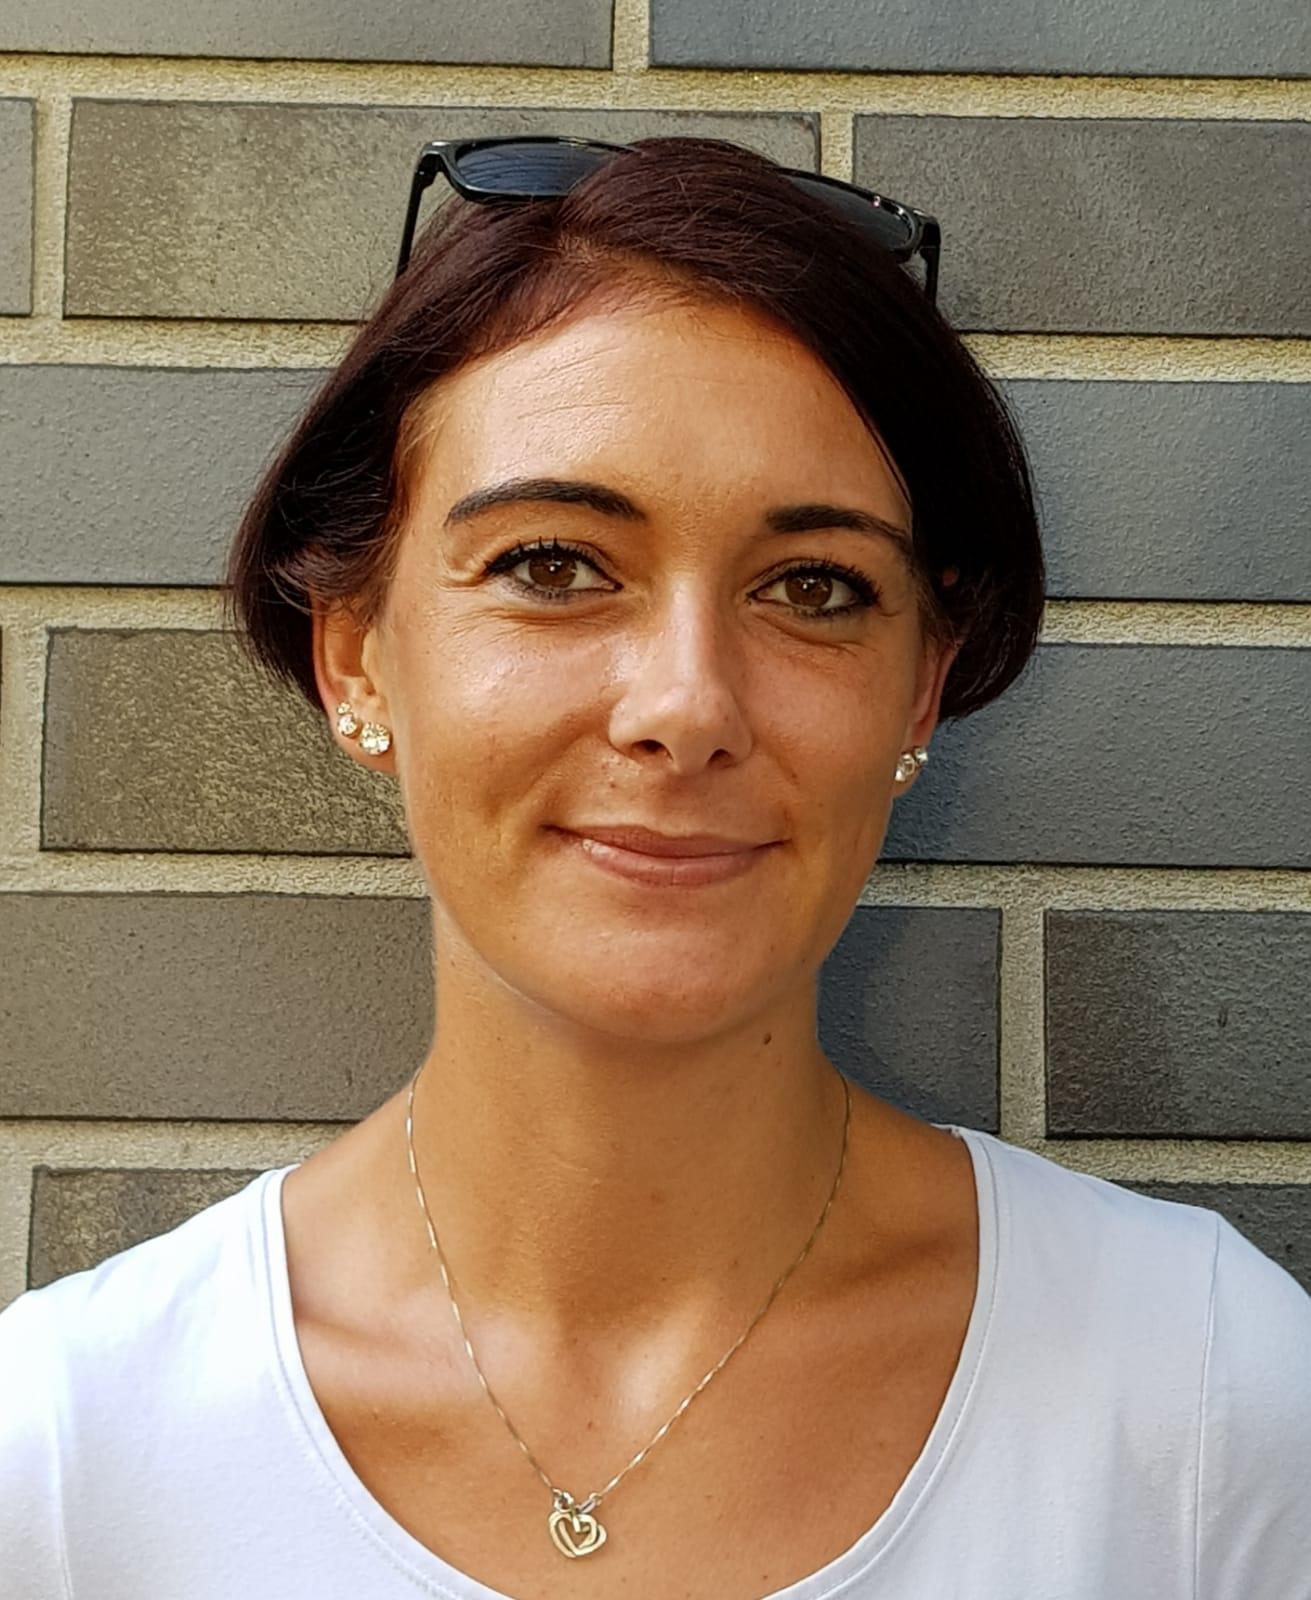 Sandra Dahmen-Stark